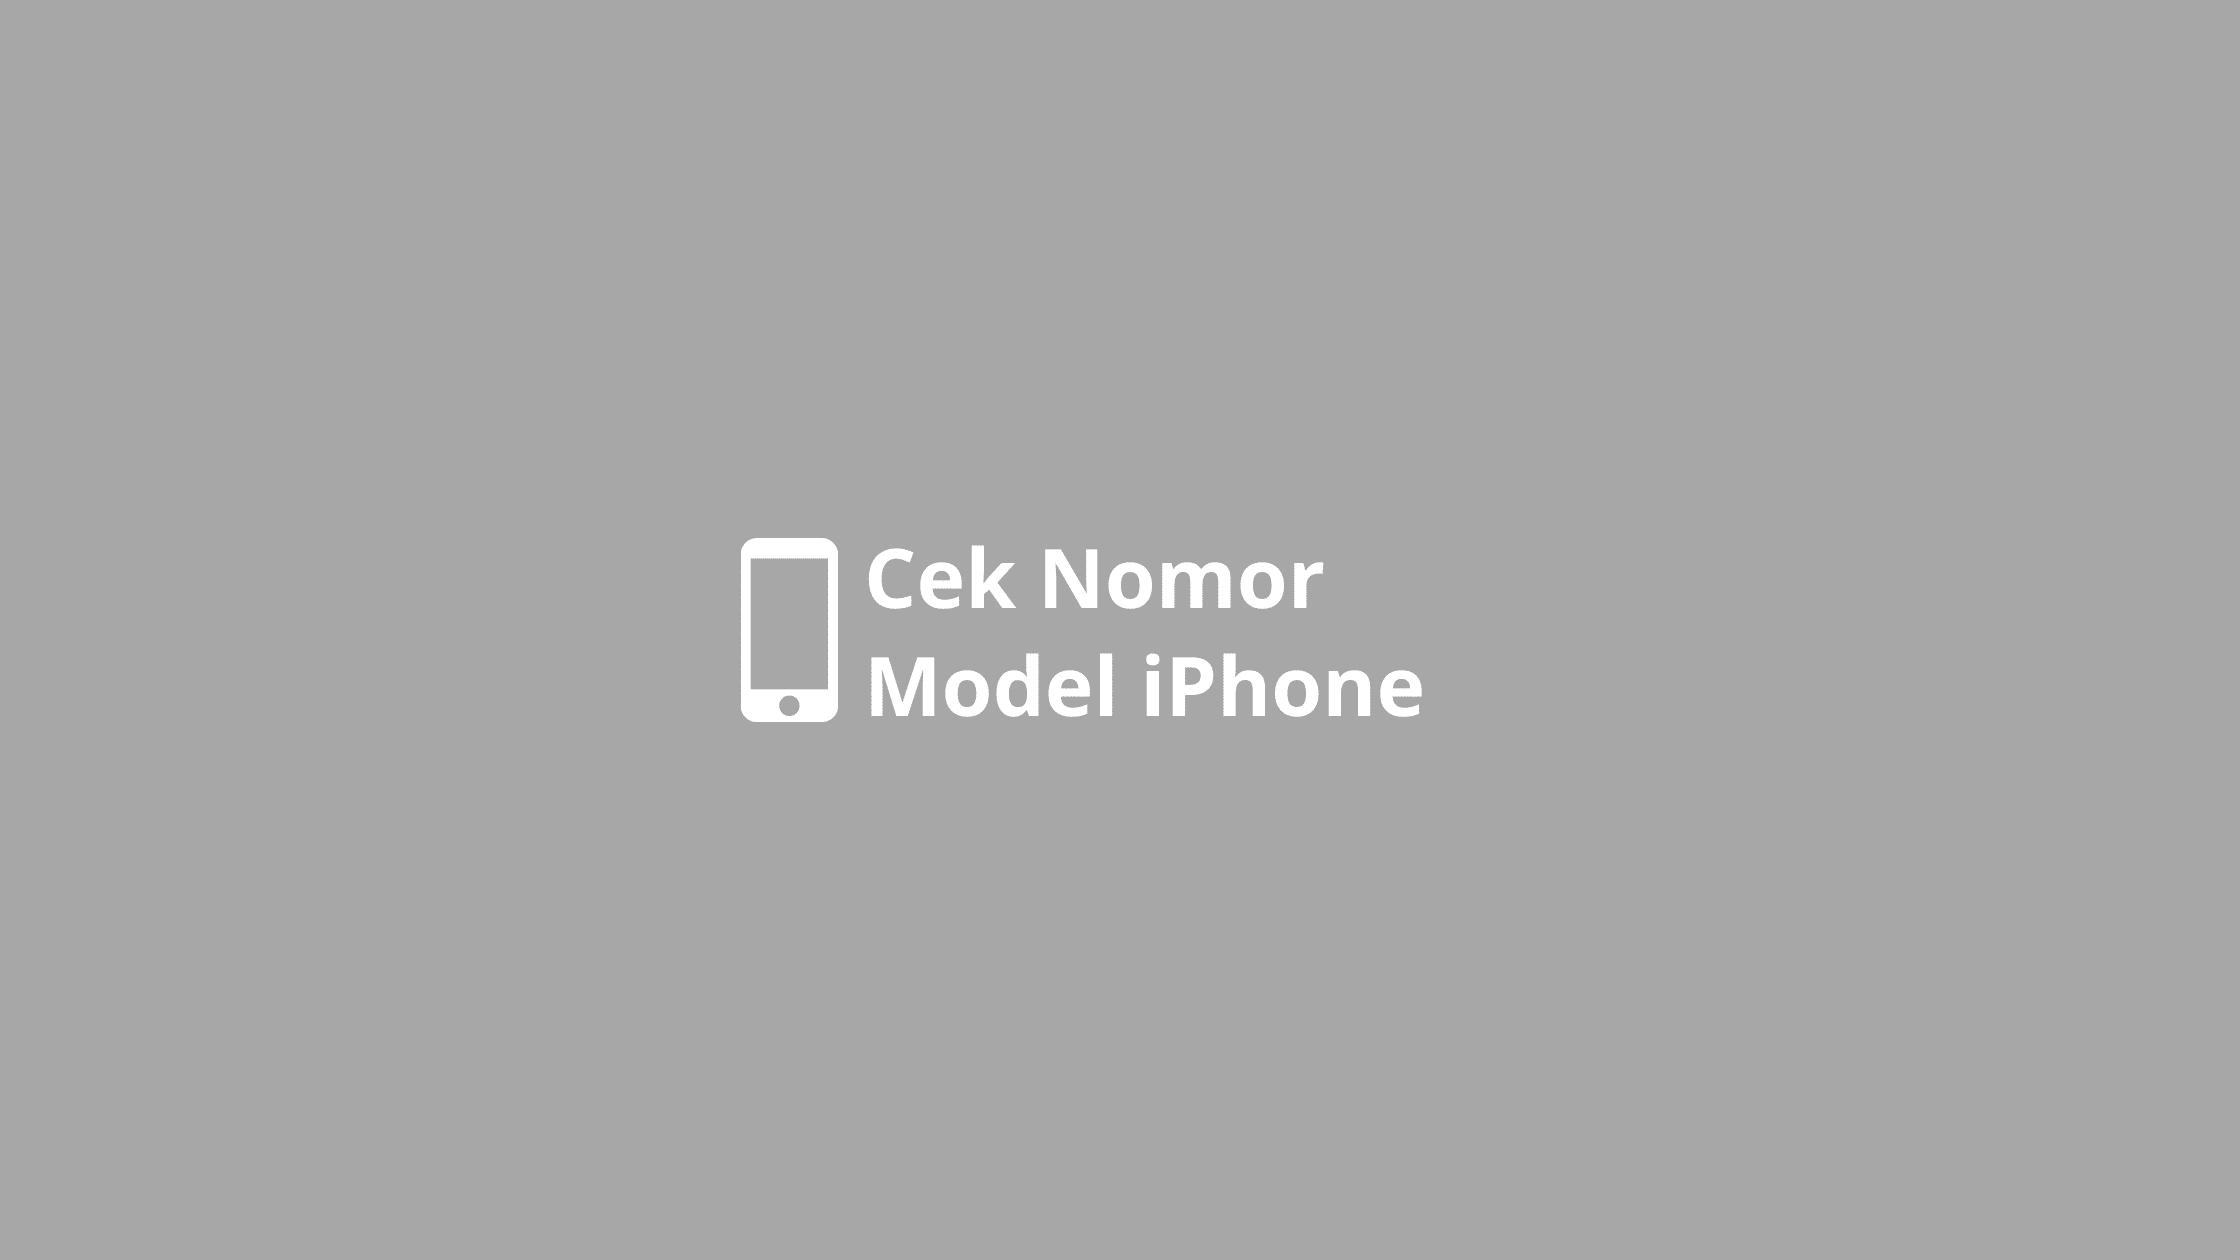 cek nomor model iPhone